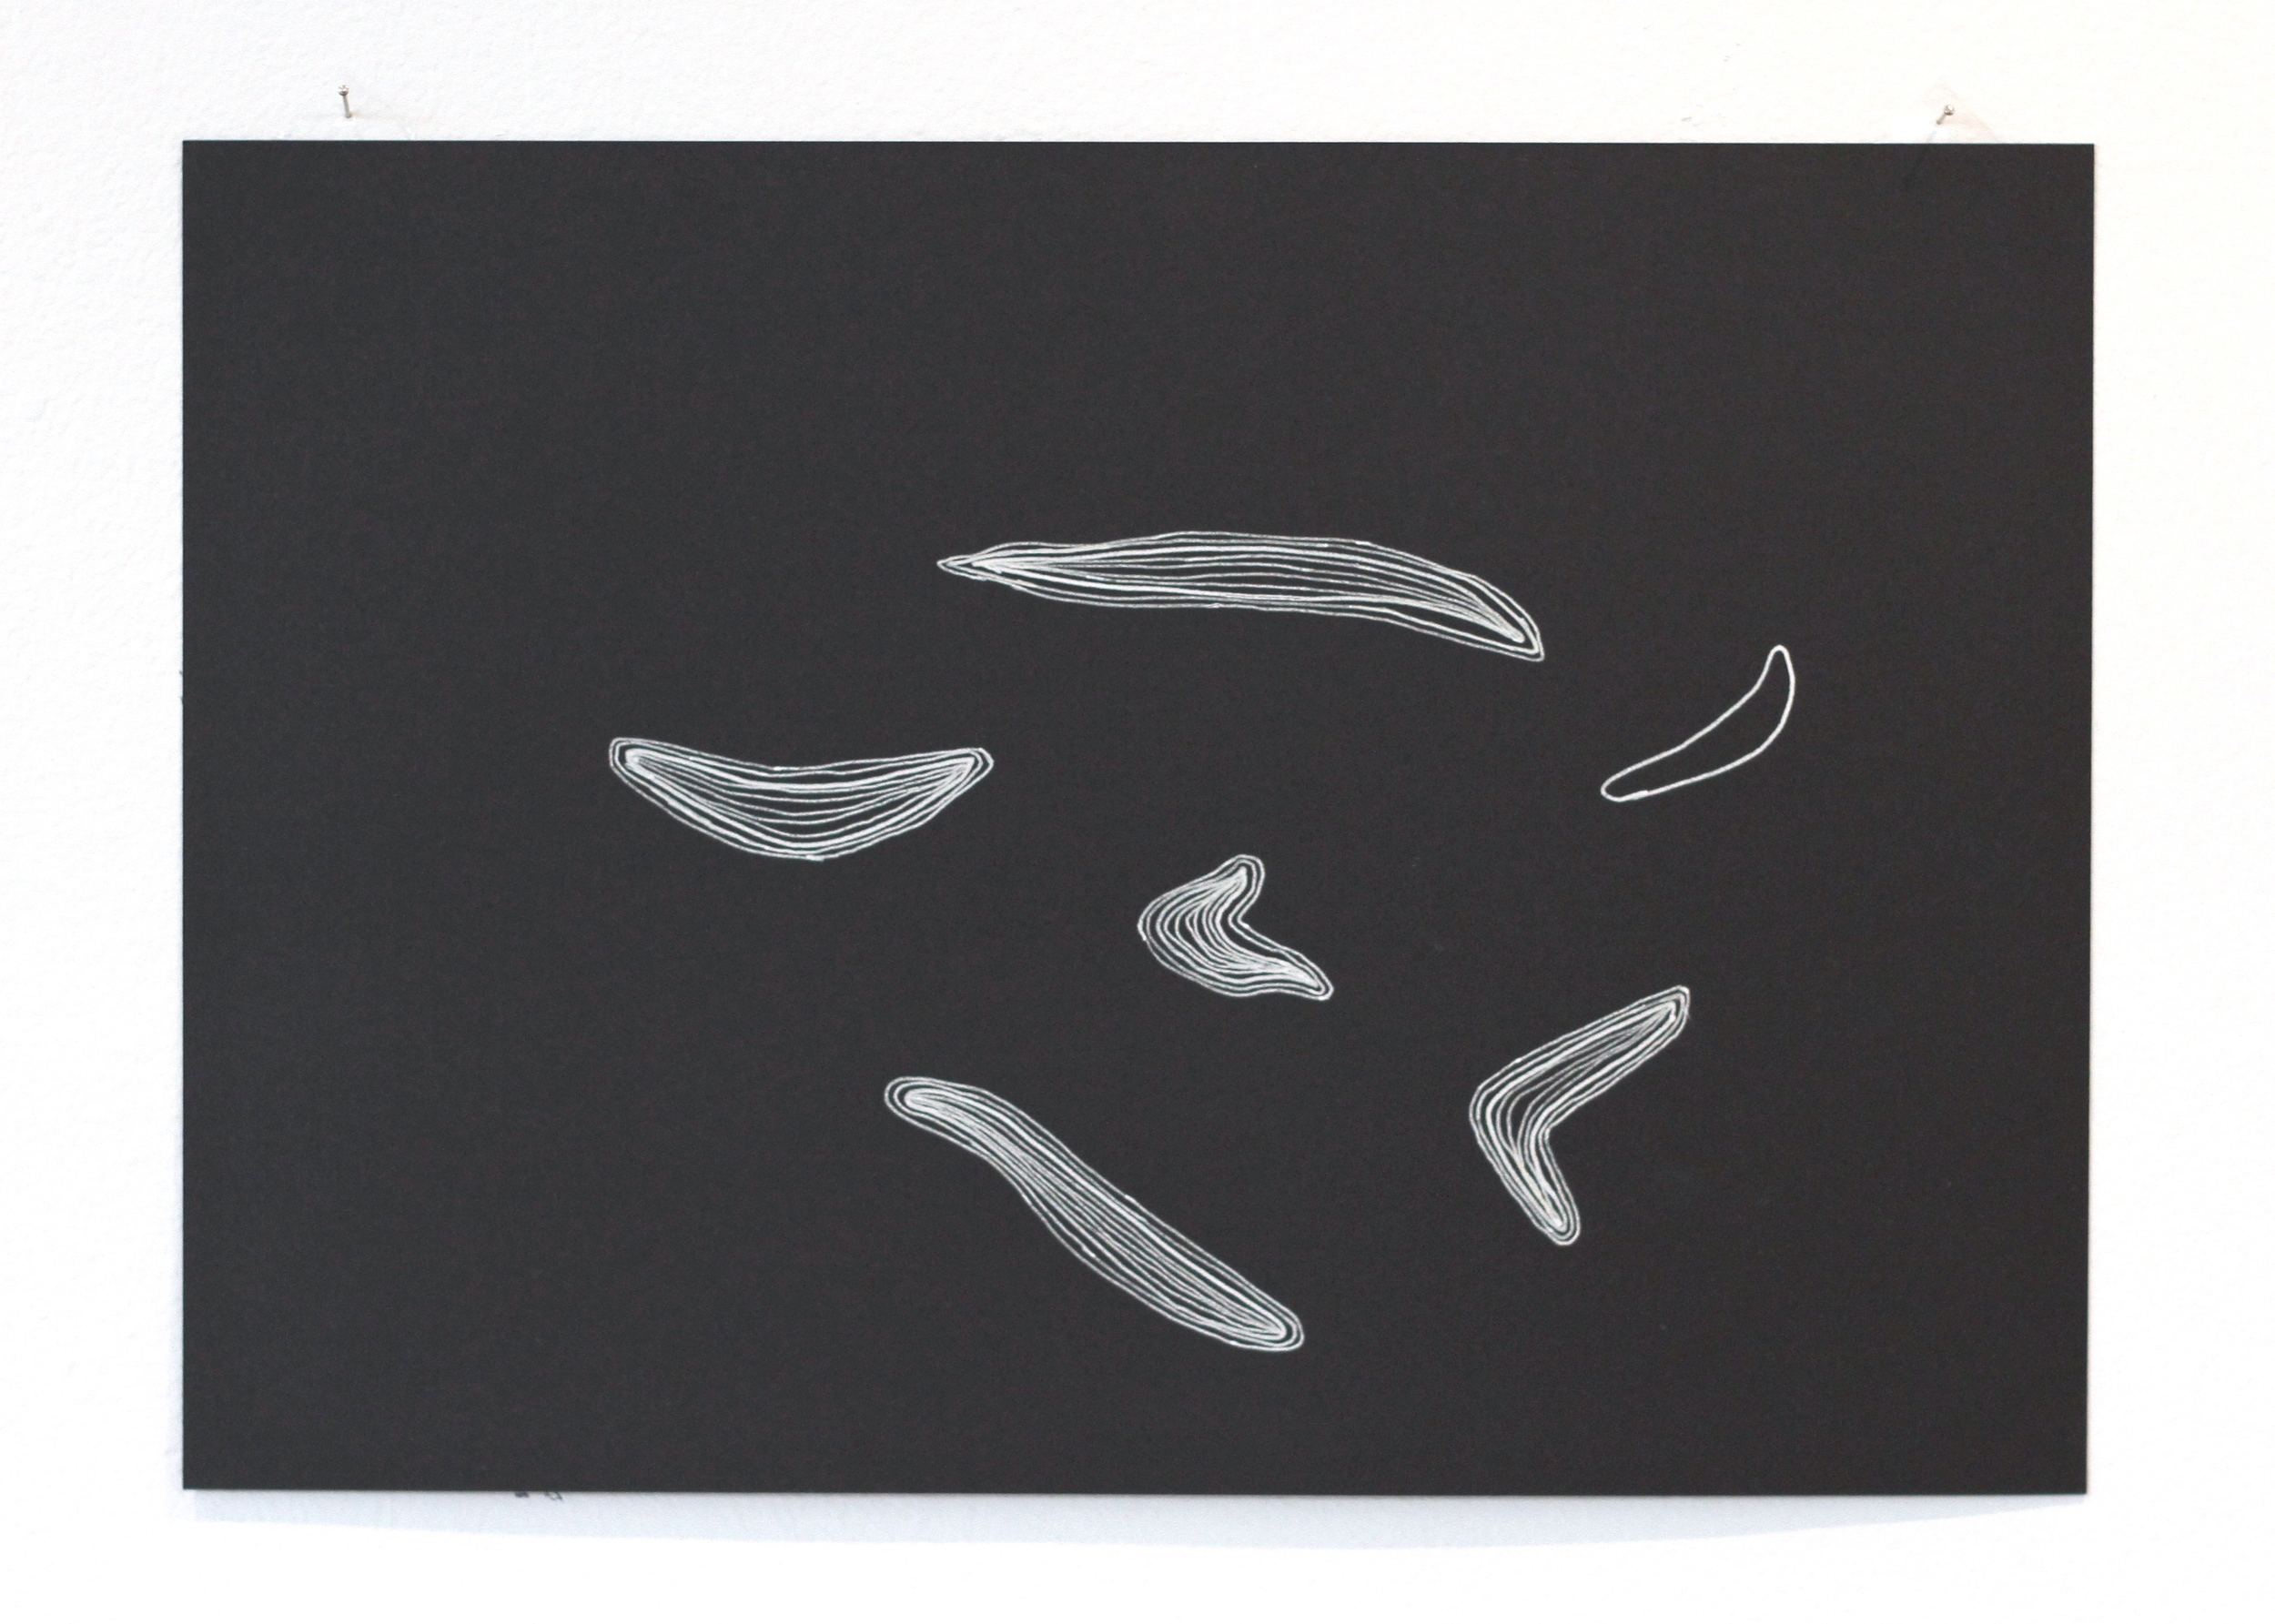 Ān fenjān hāye chāi ke bā ham nanooshidim / Those cups of tea we didn't share 2, Léuli Eshraghi, ink on card, 21 x 29.5cm, 2014